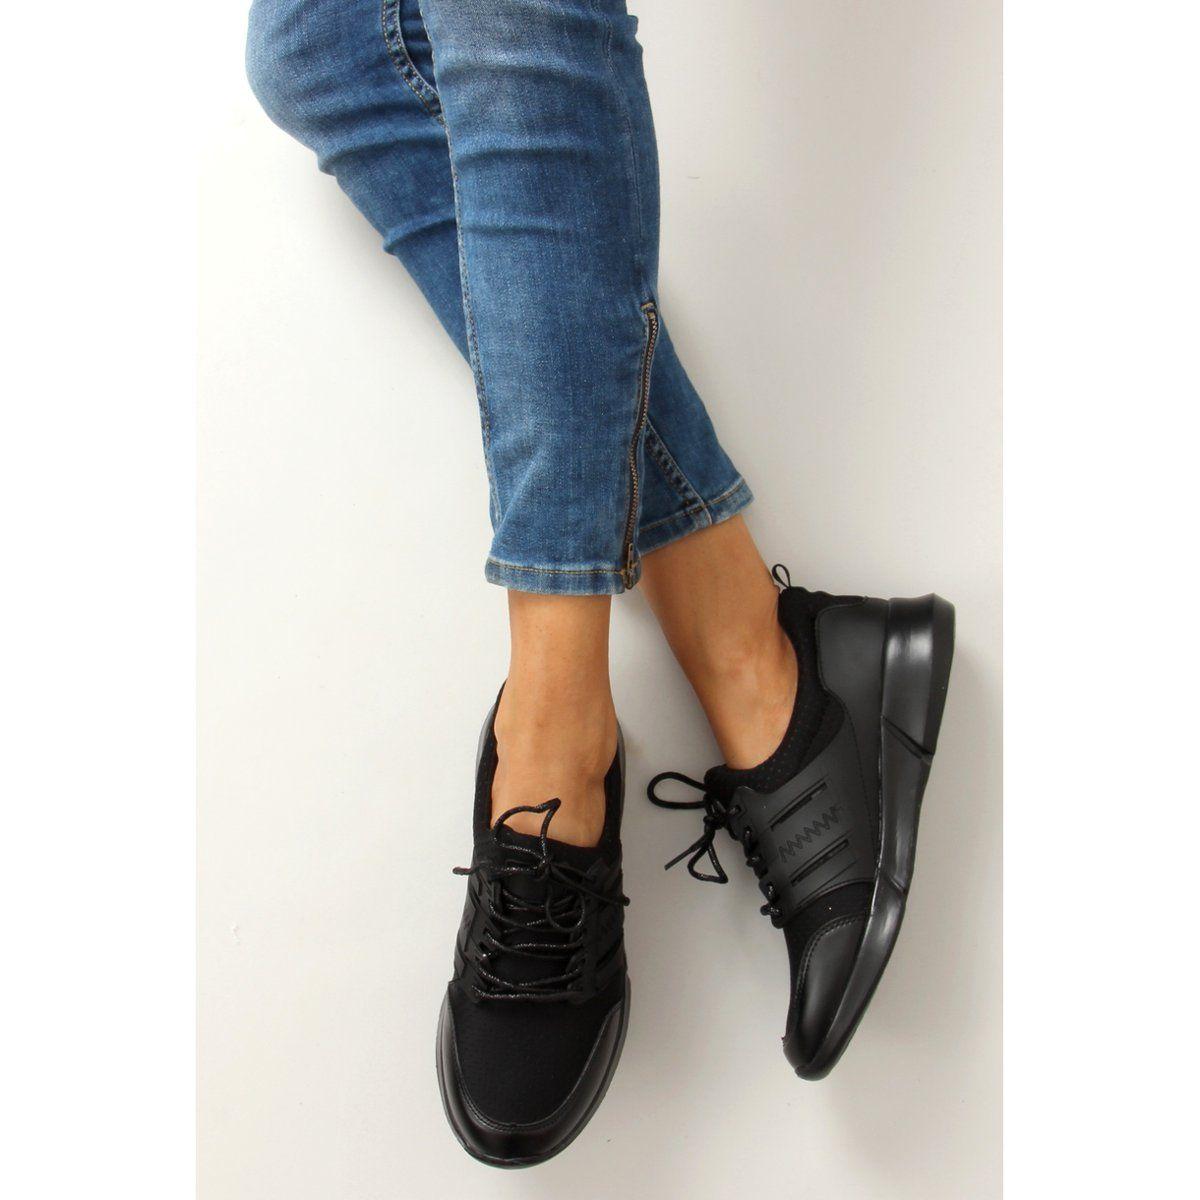 Lekkie Buty Sportowe B3120b Sp Black Czarne Womens Oxfords Oxford Shoes Shoes